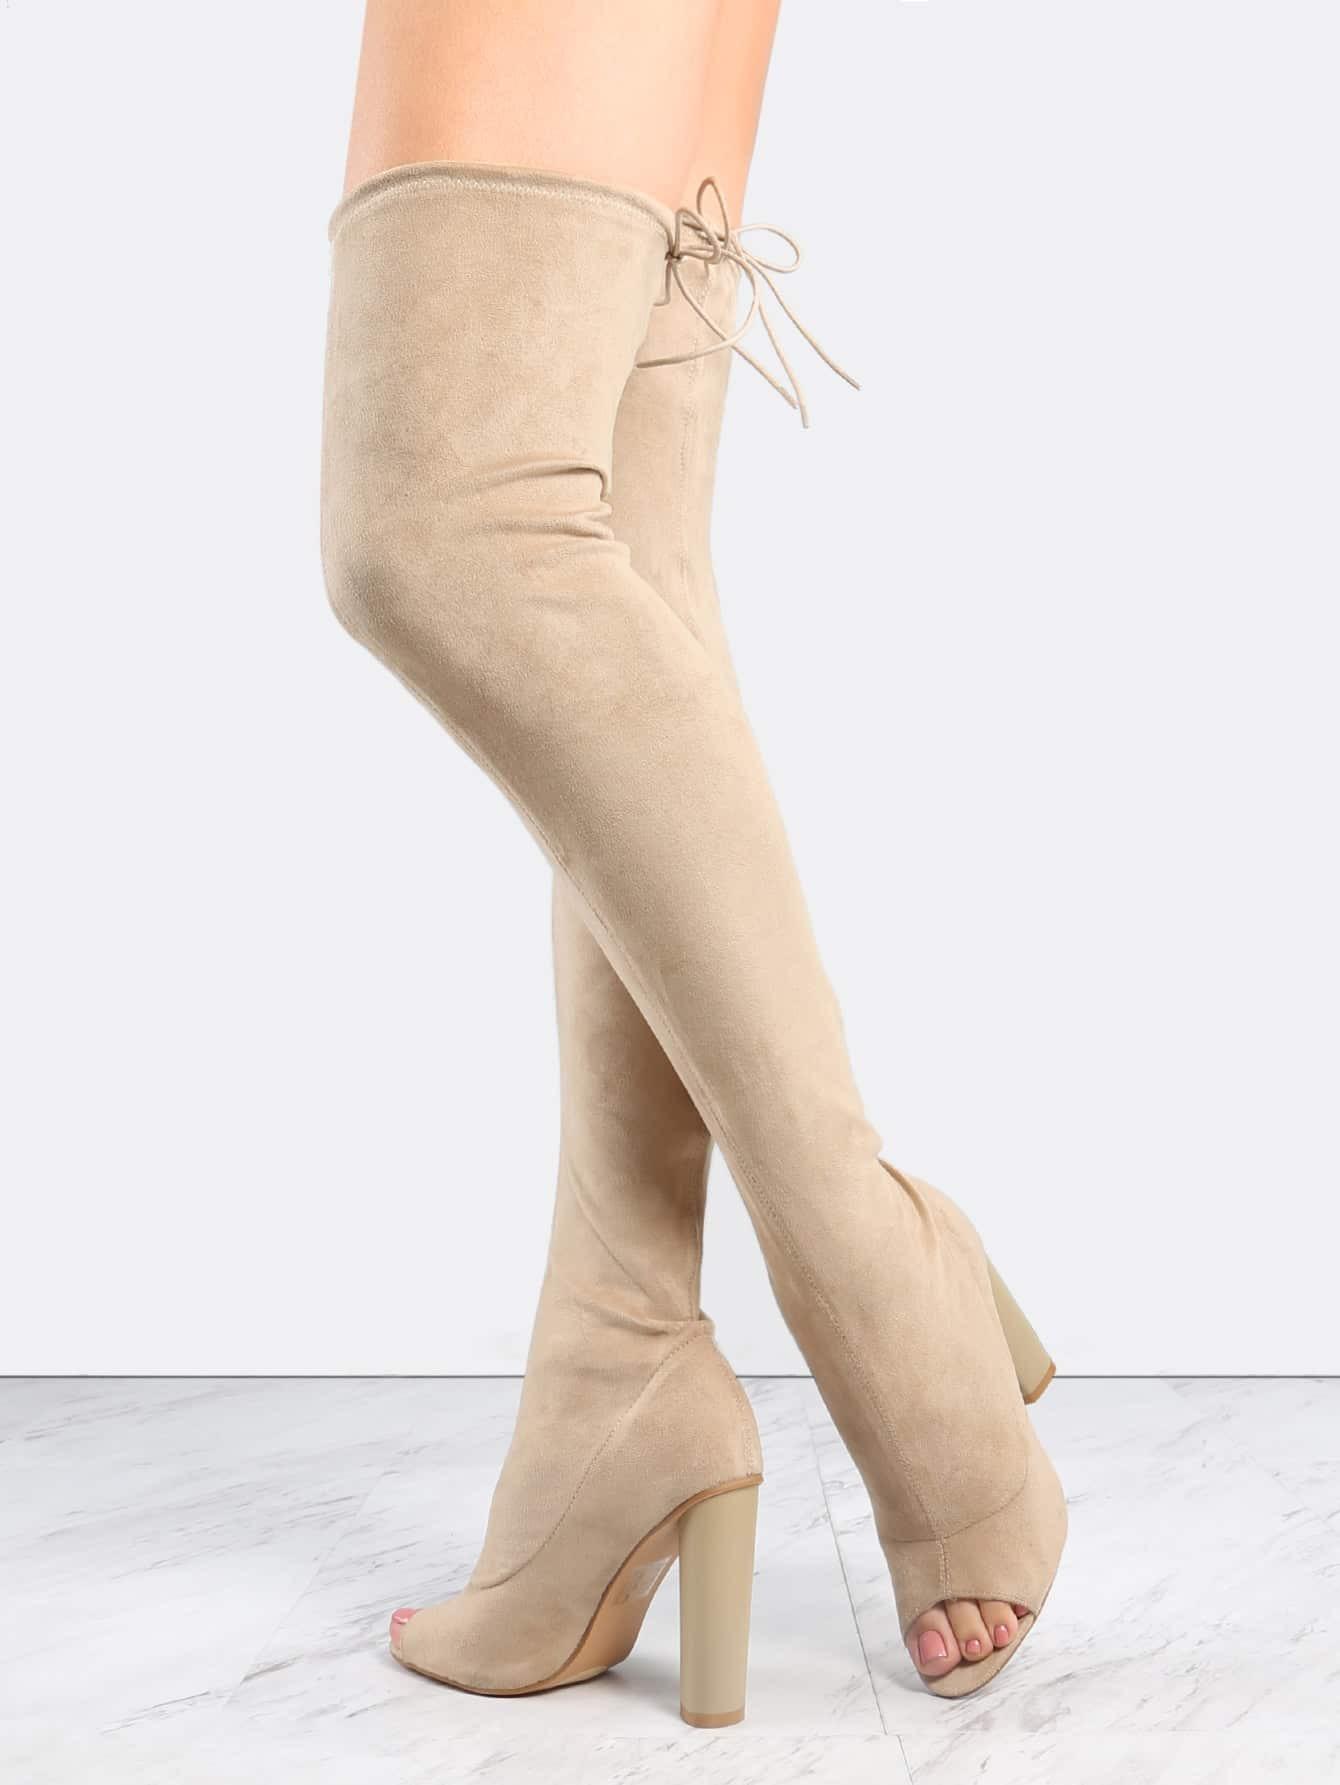 Nude Suede Peep Toe Chunky Heel Over The Knee Boots mmcboot-kate2m-nude